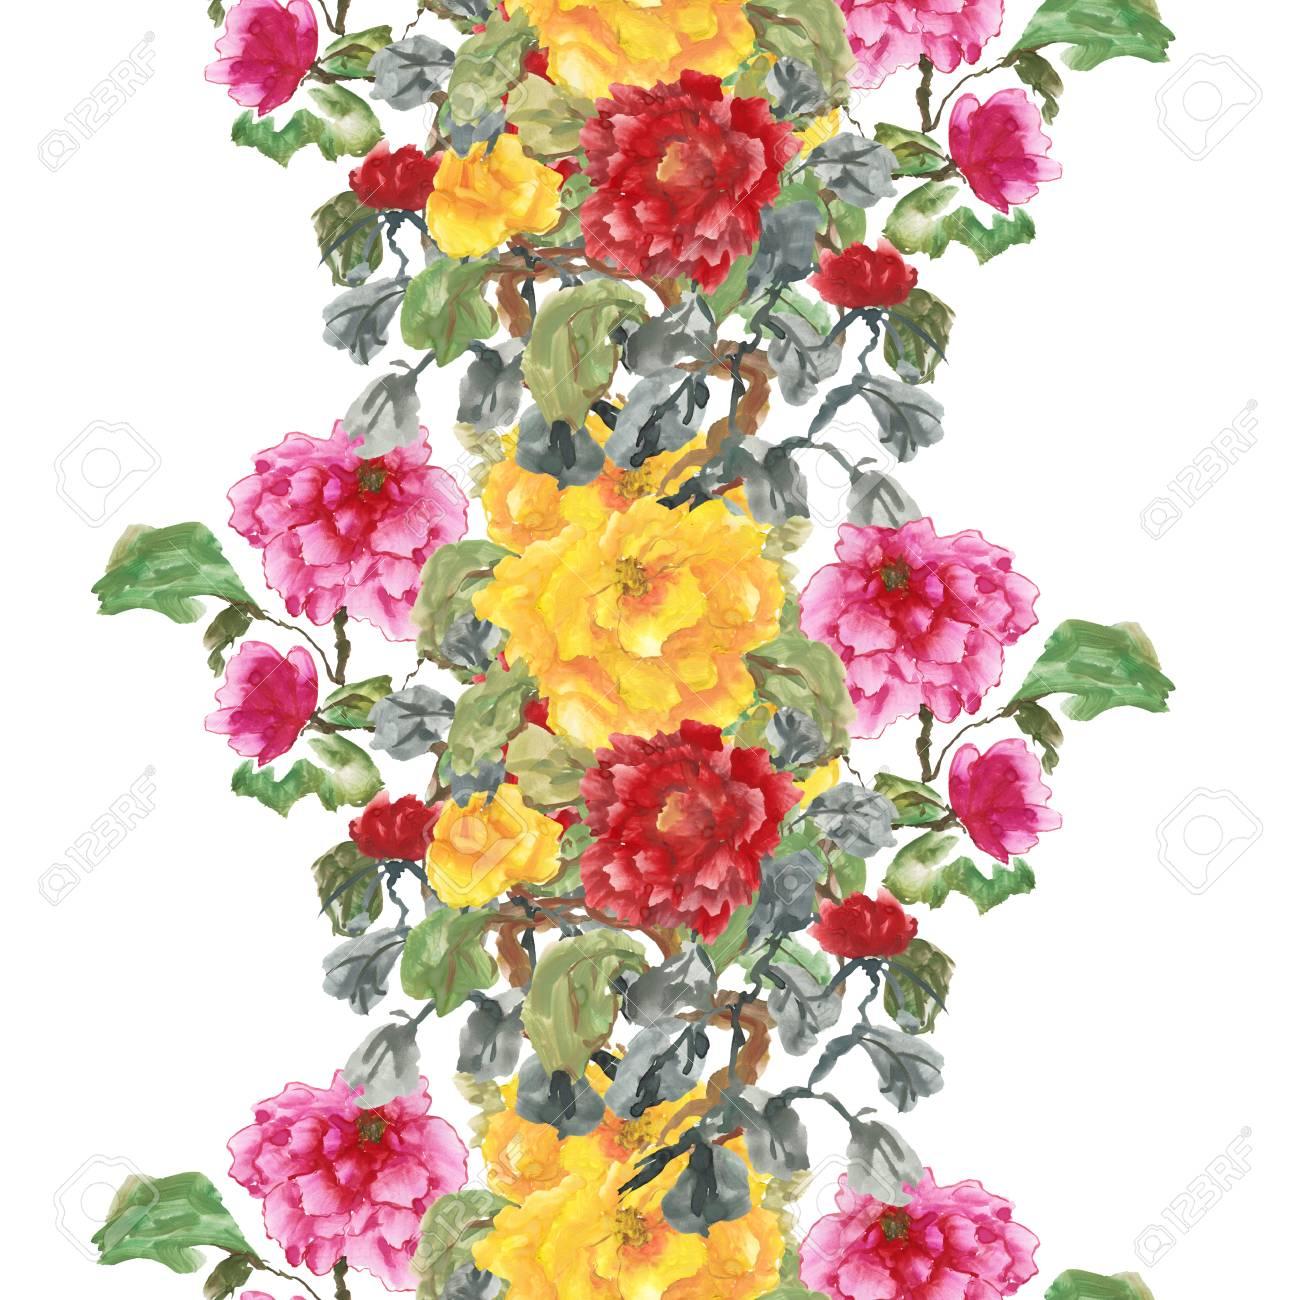 yellow flowers floral art roses watercolor painting original 4 x 6  Pink artichoke Peonies